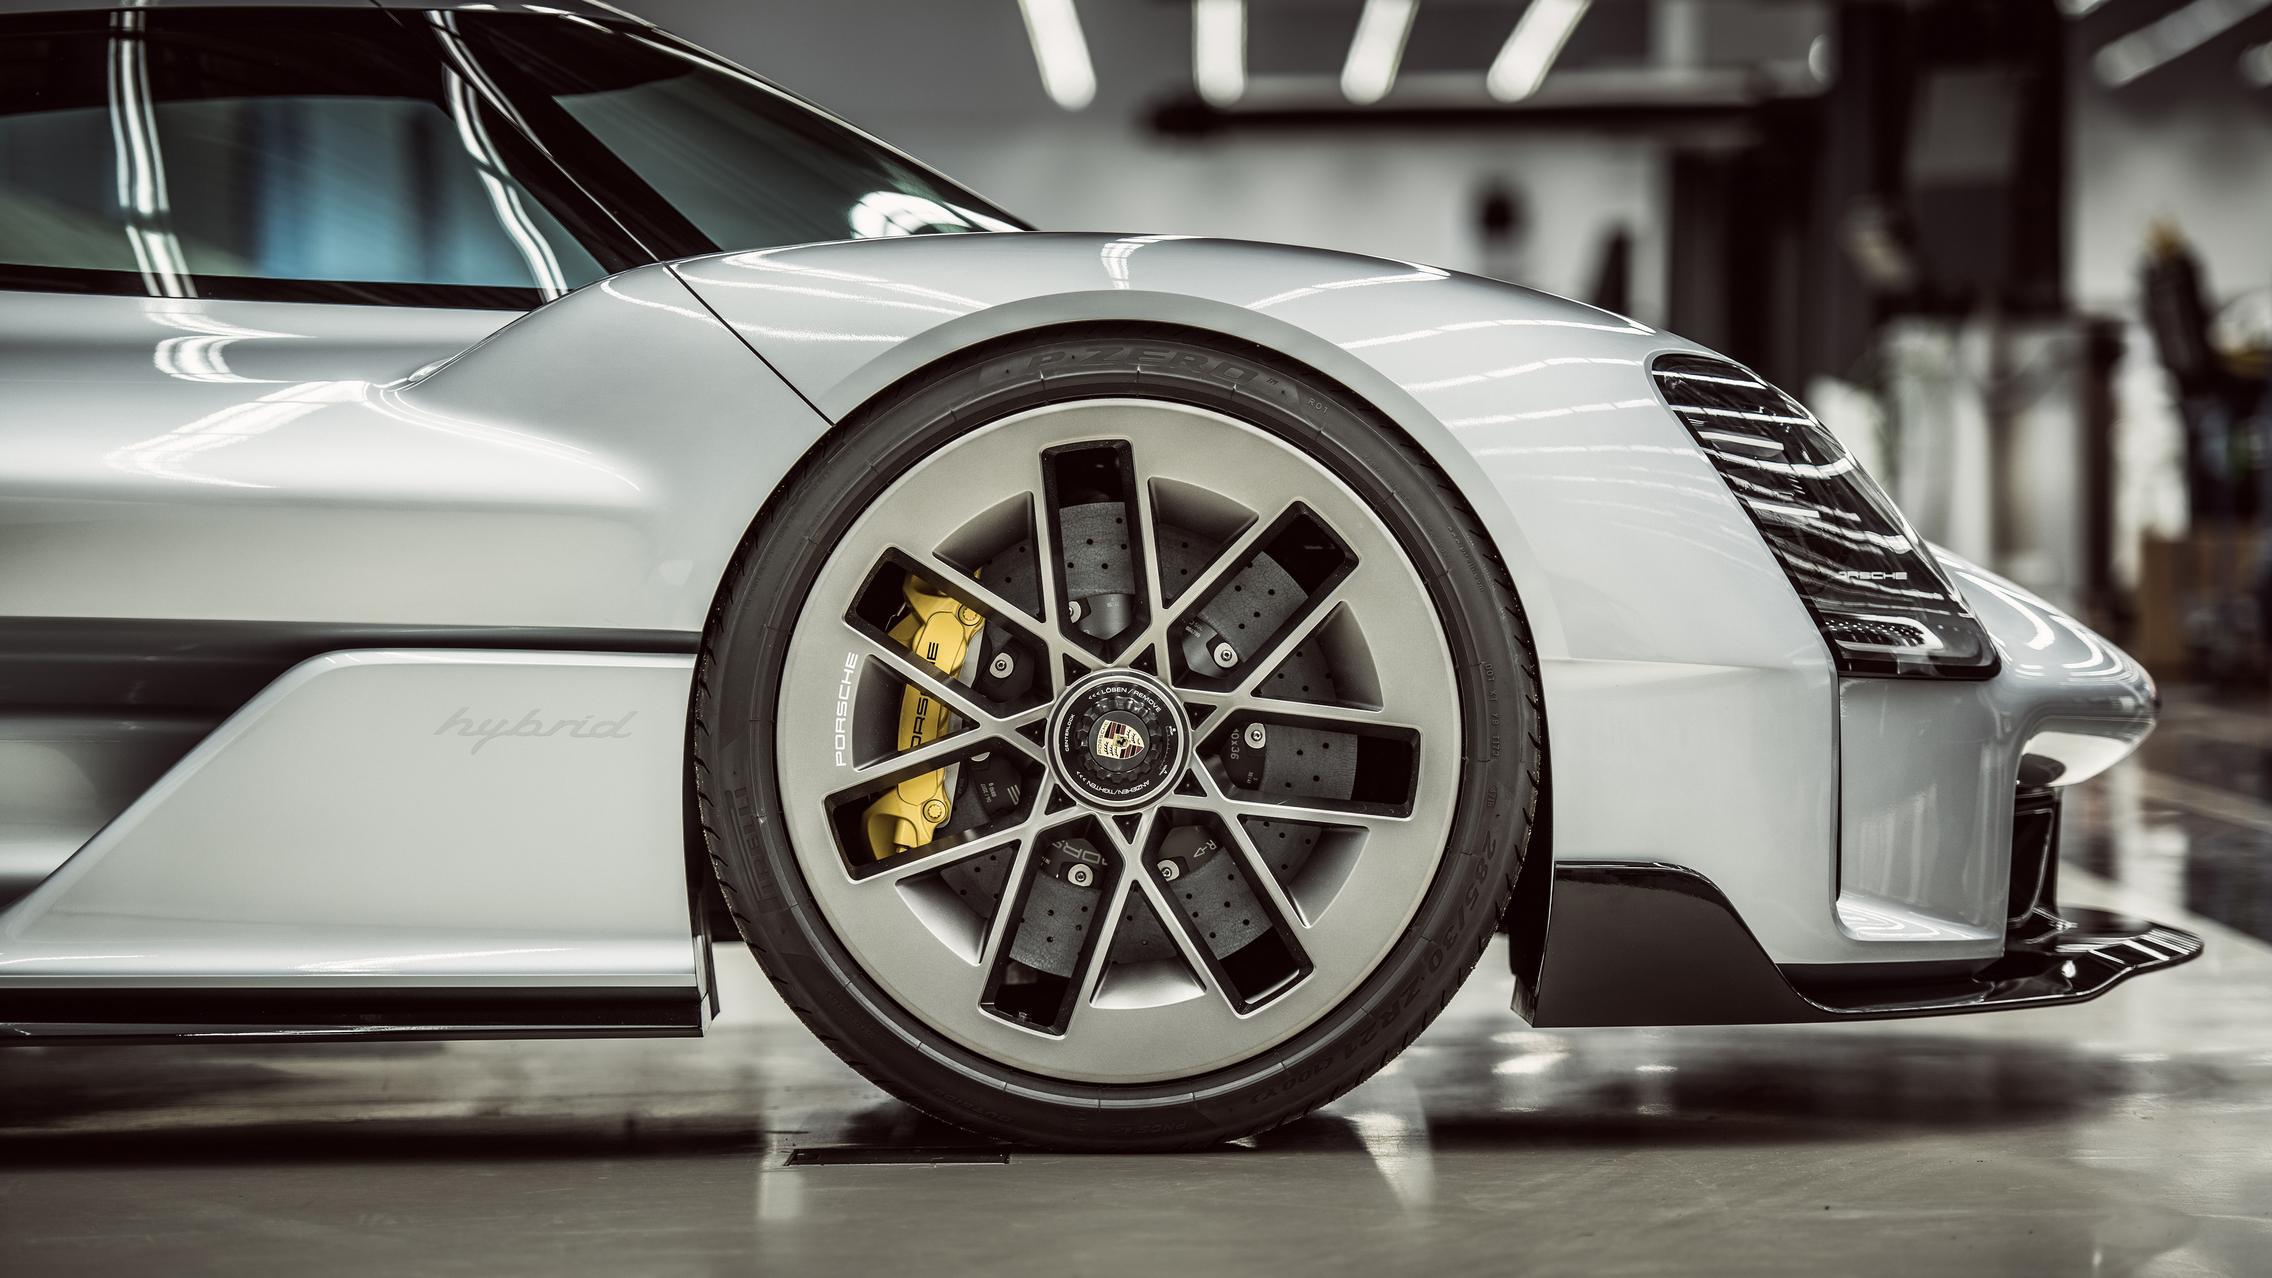 Porsche 919 Street wheels